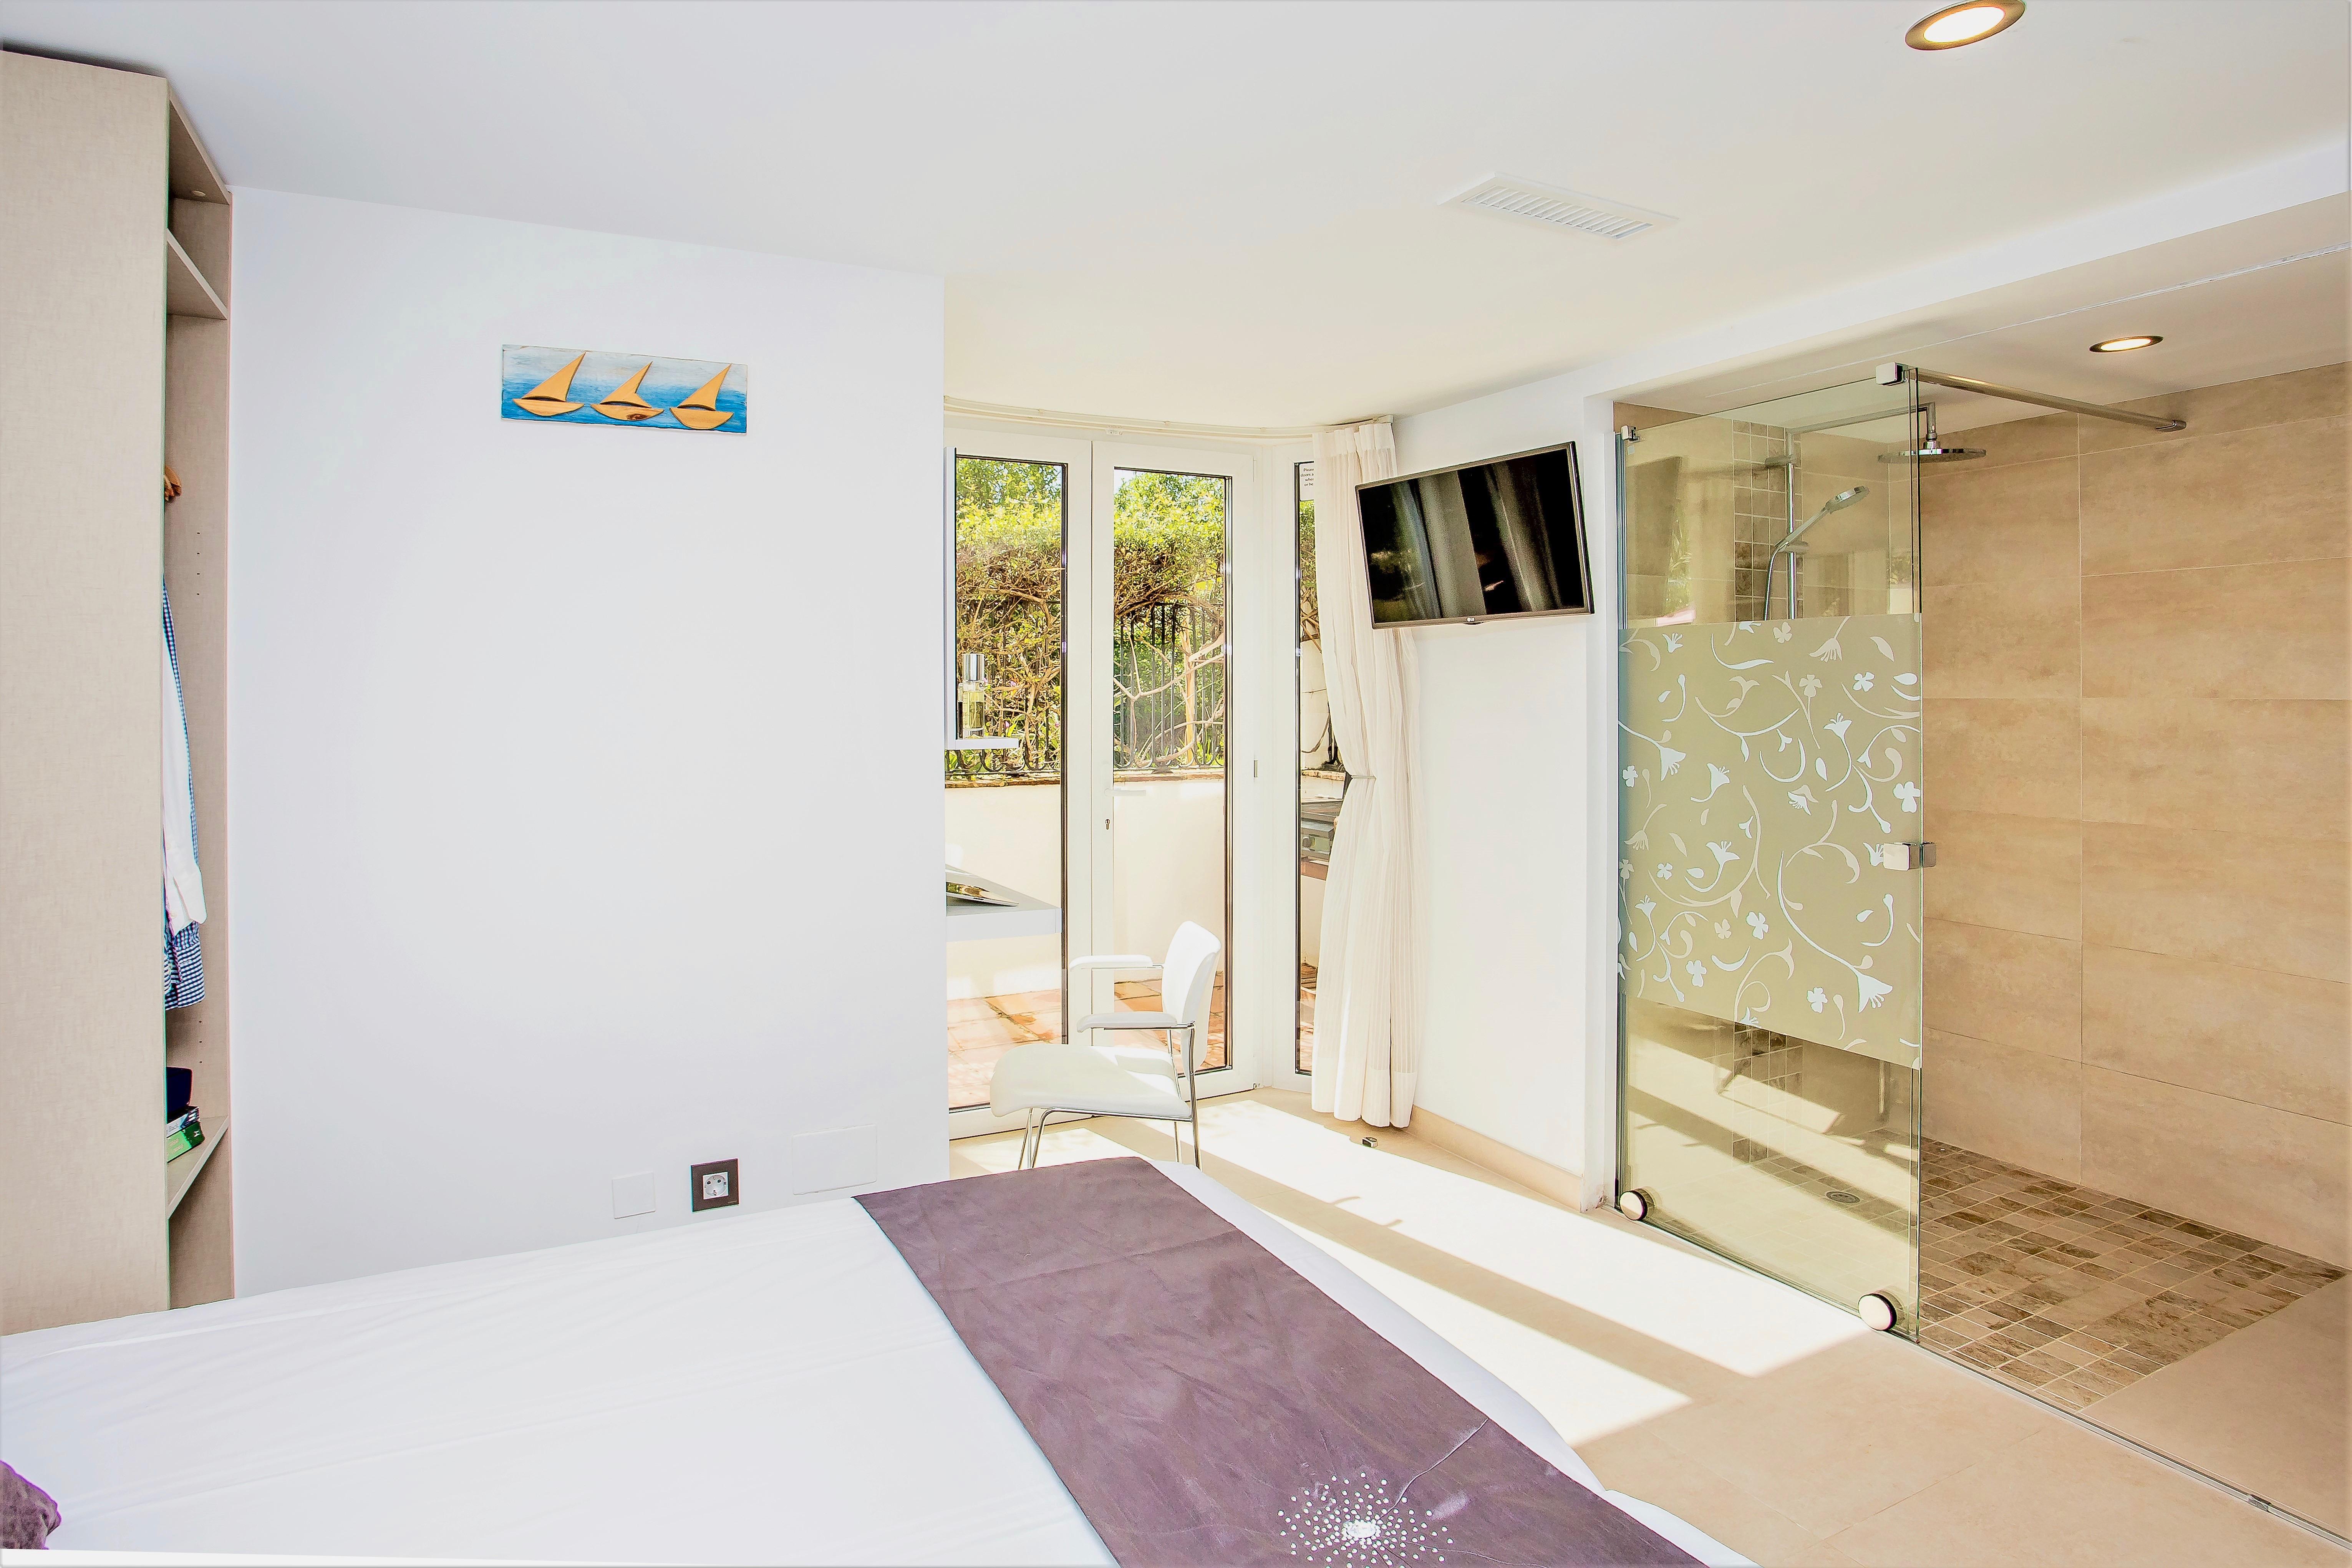 Apartment 8 Bedroom VILLA BY PUERTO BANUS   SEA 5 min                                photo 16956480